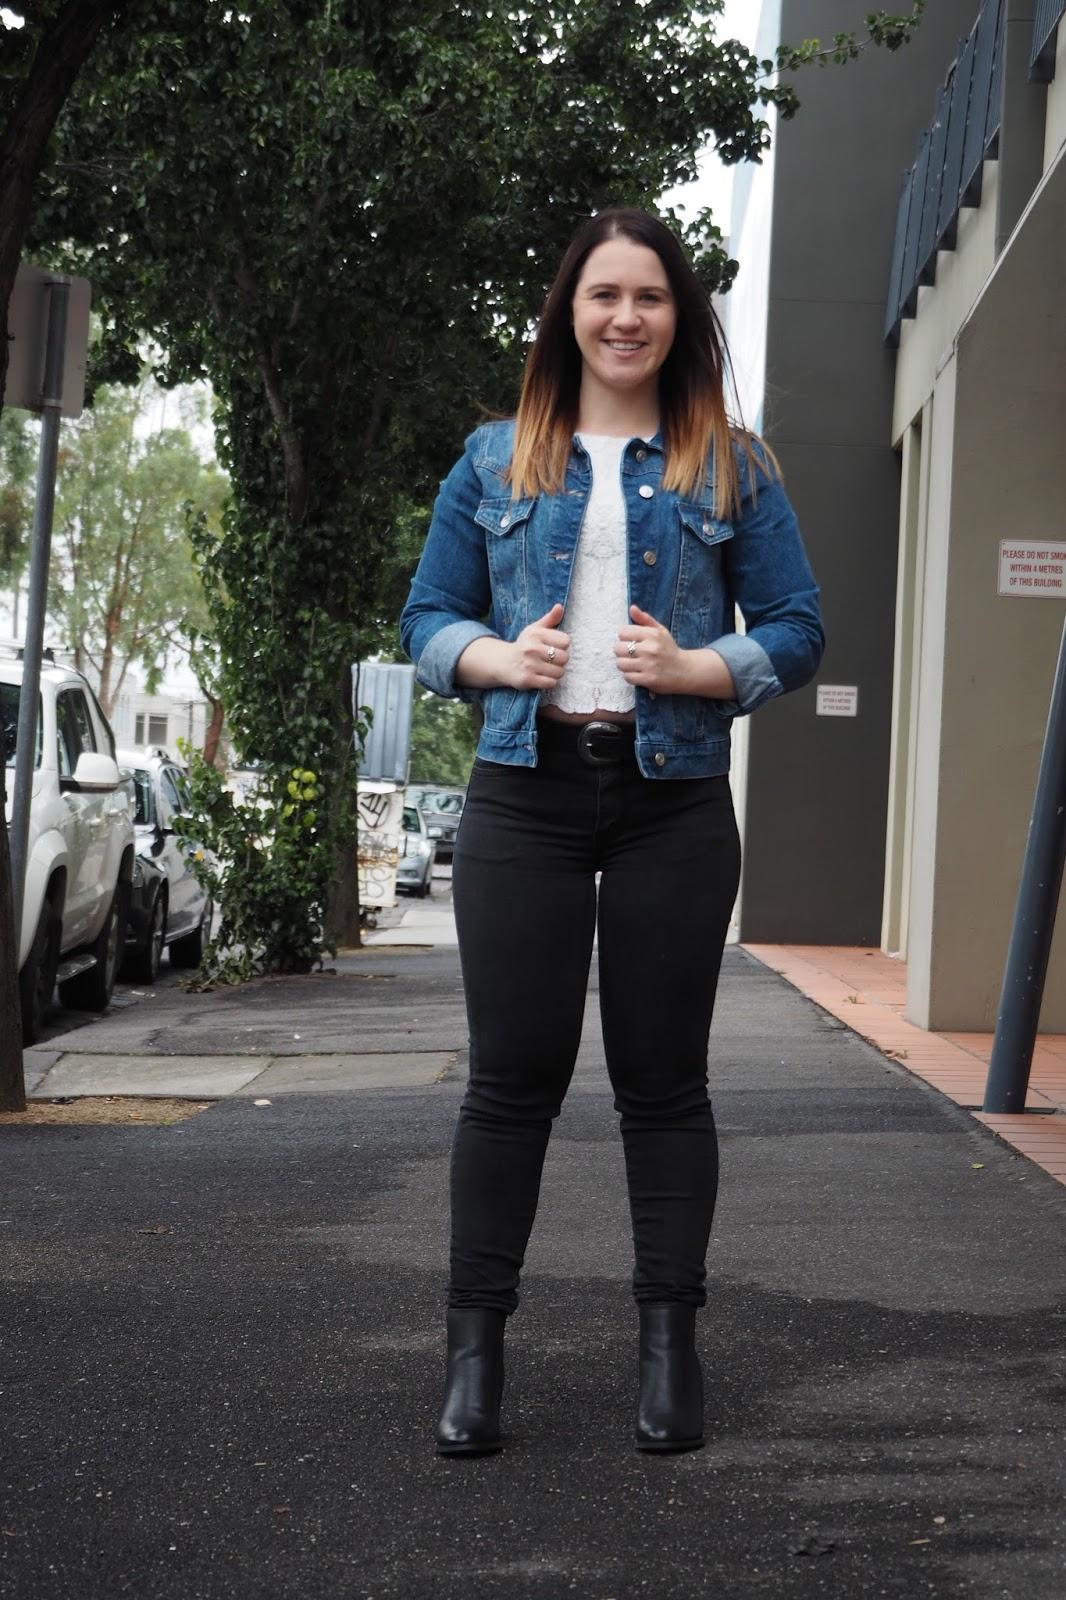 black jeans, lace top, black ankle boots, denim jacket, western belt, tan bucket bag, black jeans and a denim jacket, petite outfit, petite girl outfit, short girl outfit, winter outfit, autumn outfit